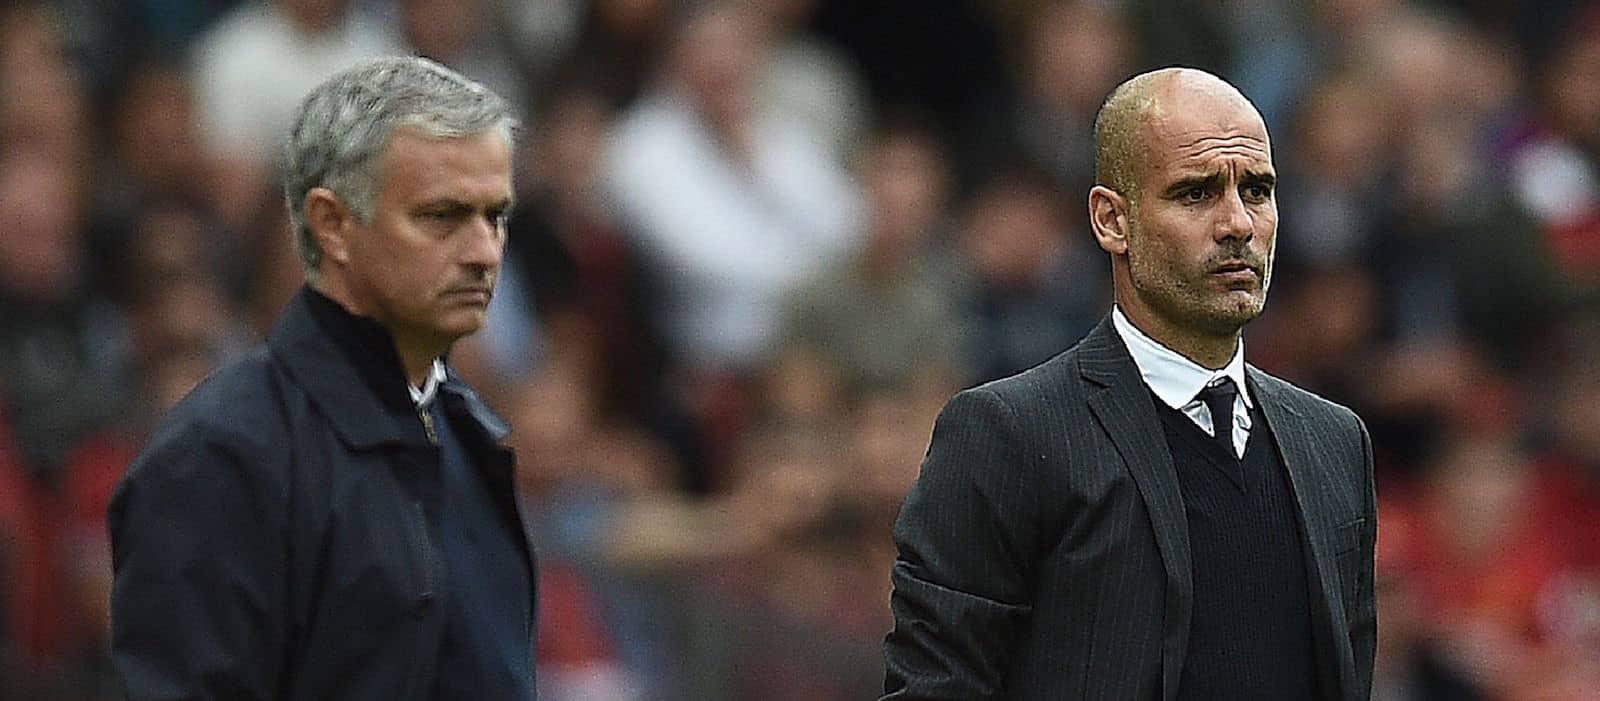 Jose Mourinho tells Manchester United to sign Napoli defender Kalidou Koulibaly – report